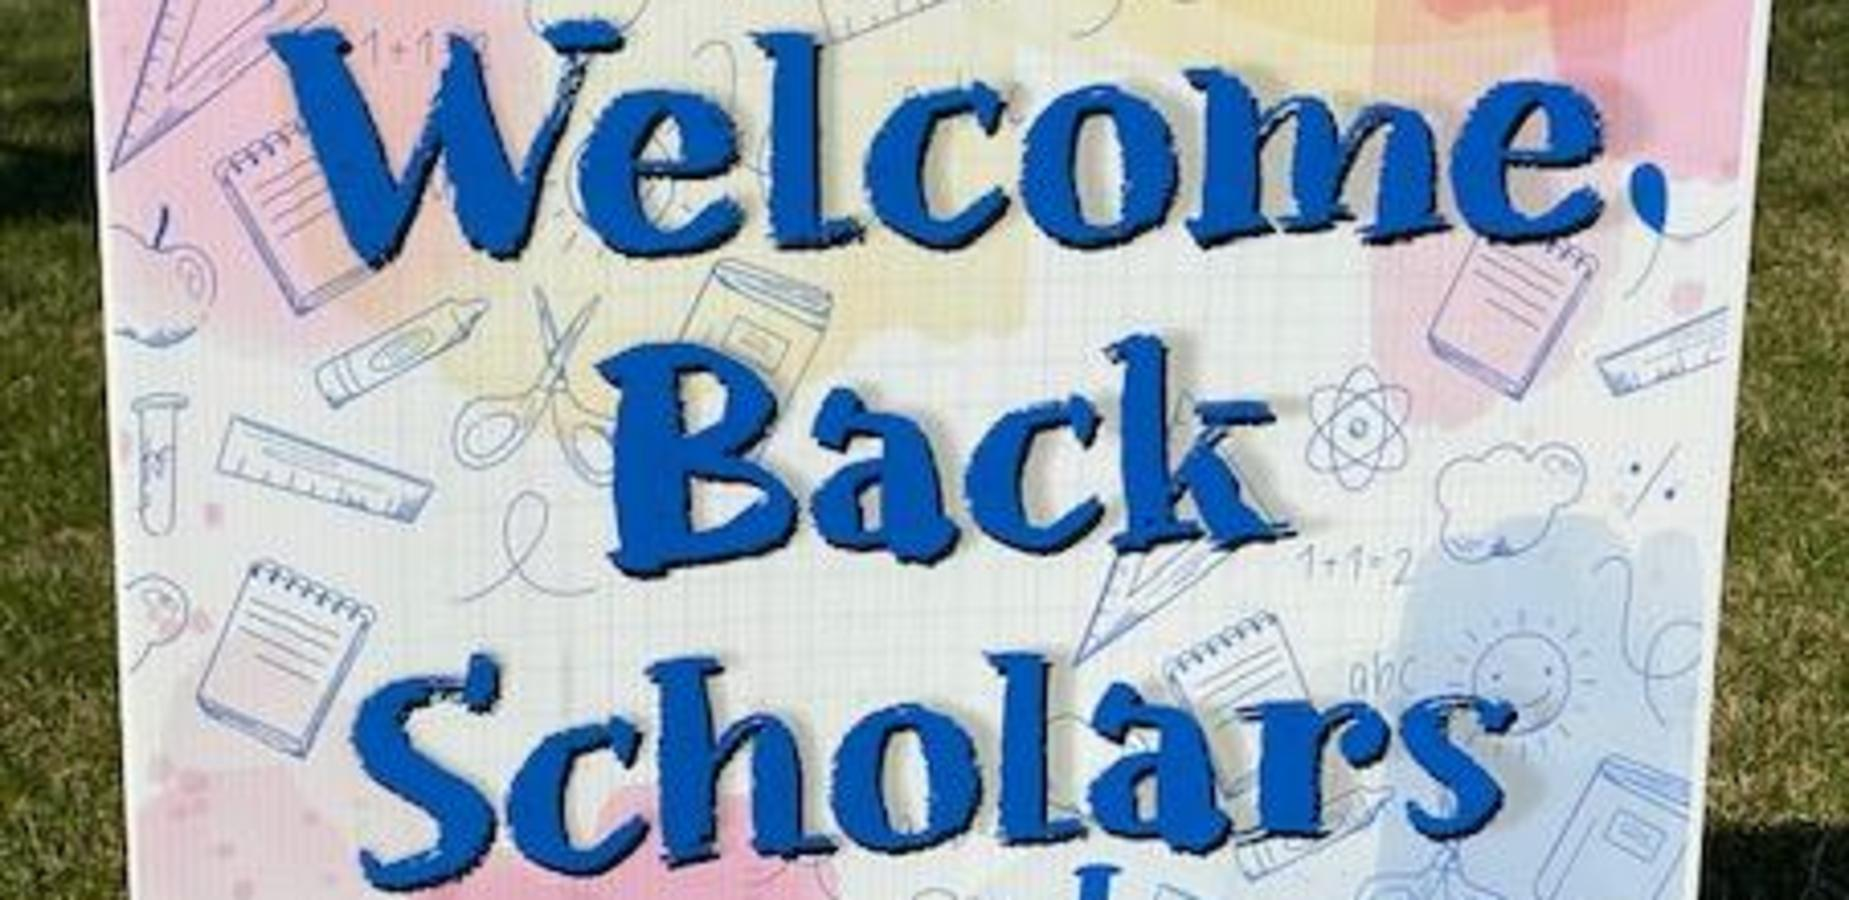 Students returning back to school in hybrid model